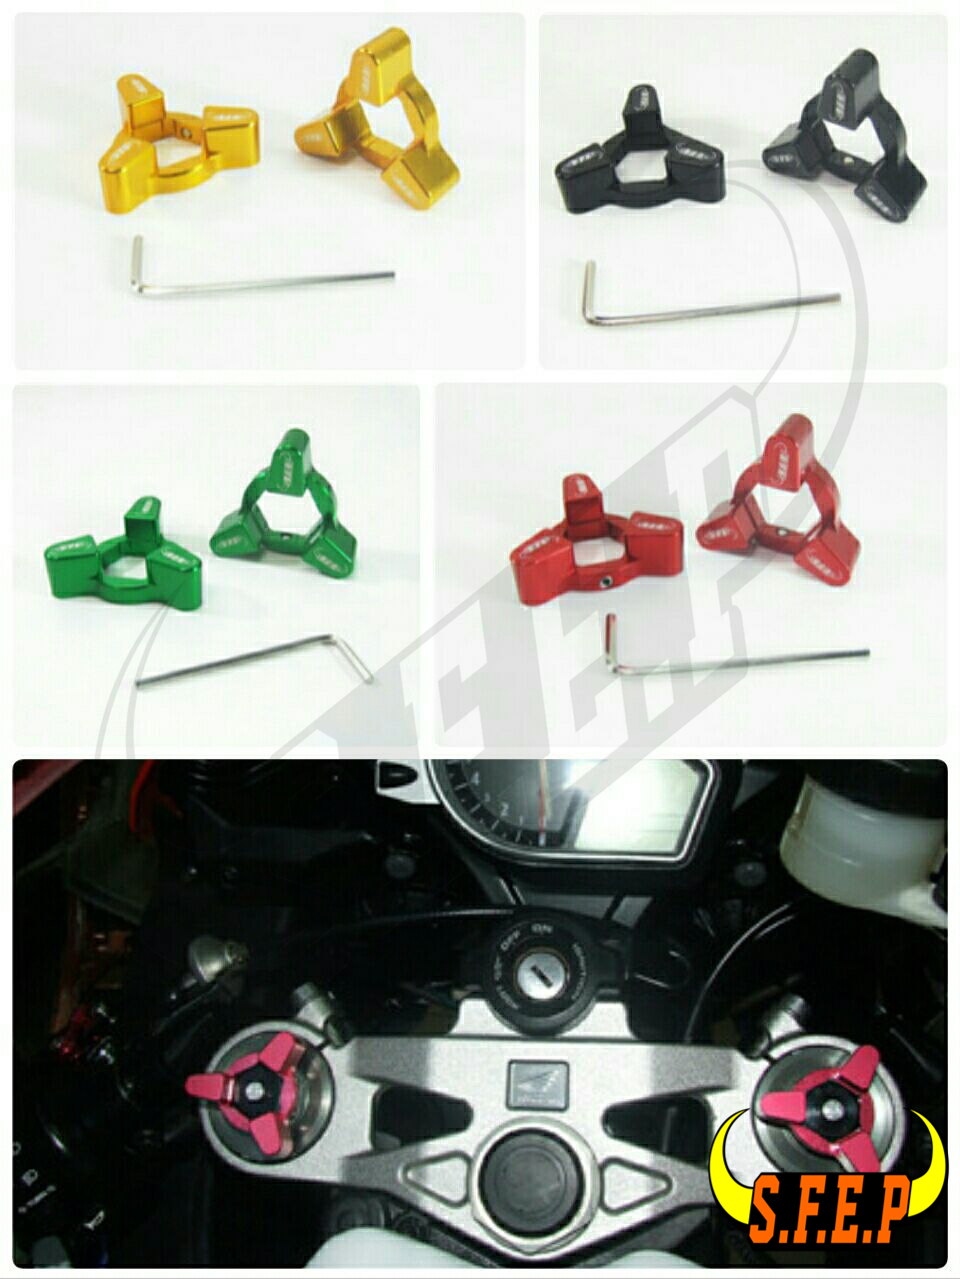 Motorcycle CNC Fork Preload Adjusters For Triumph Daytona 955i 97-06/ Speed Triple 97-04/ TT 600 00-03/ Speed Four 03-06